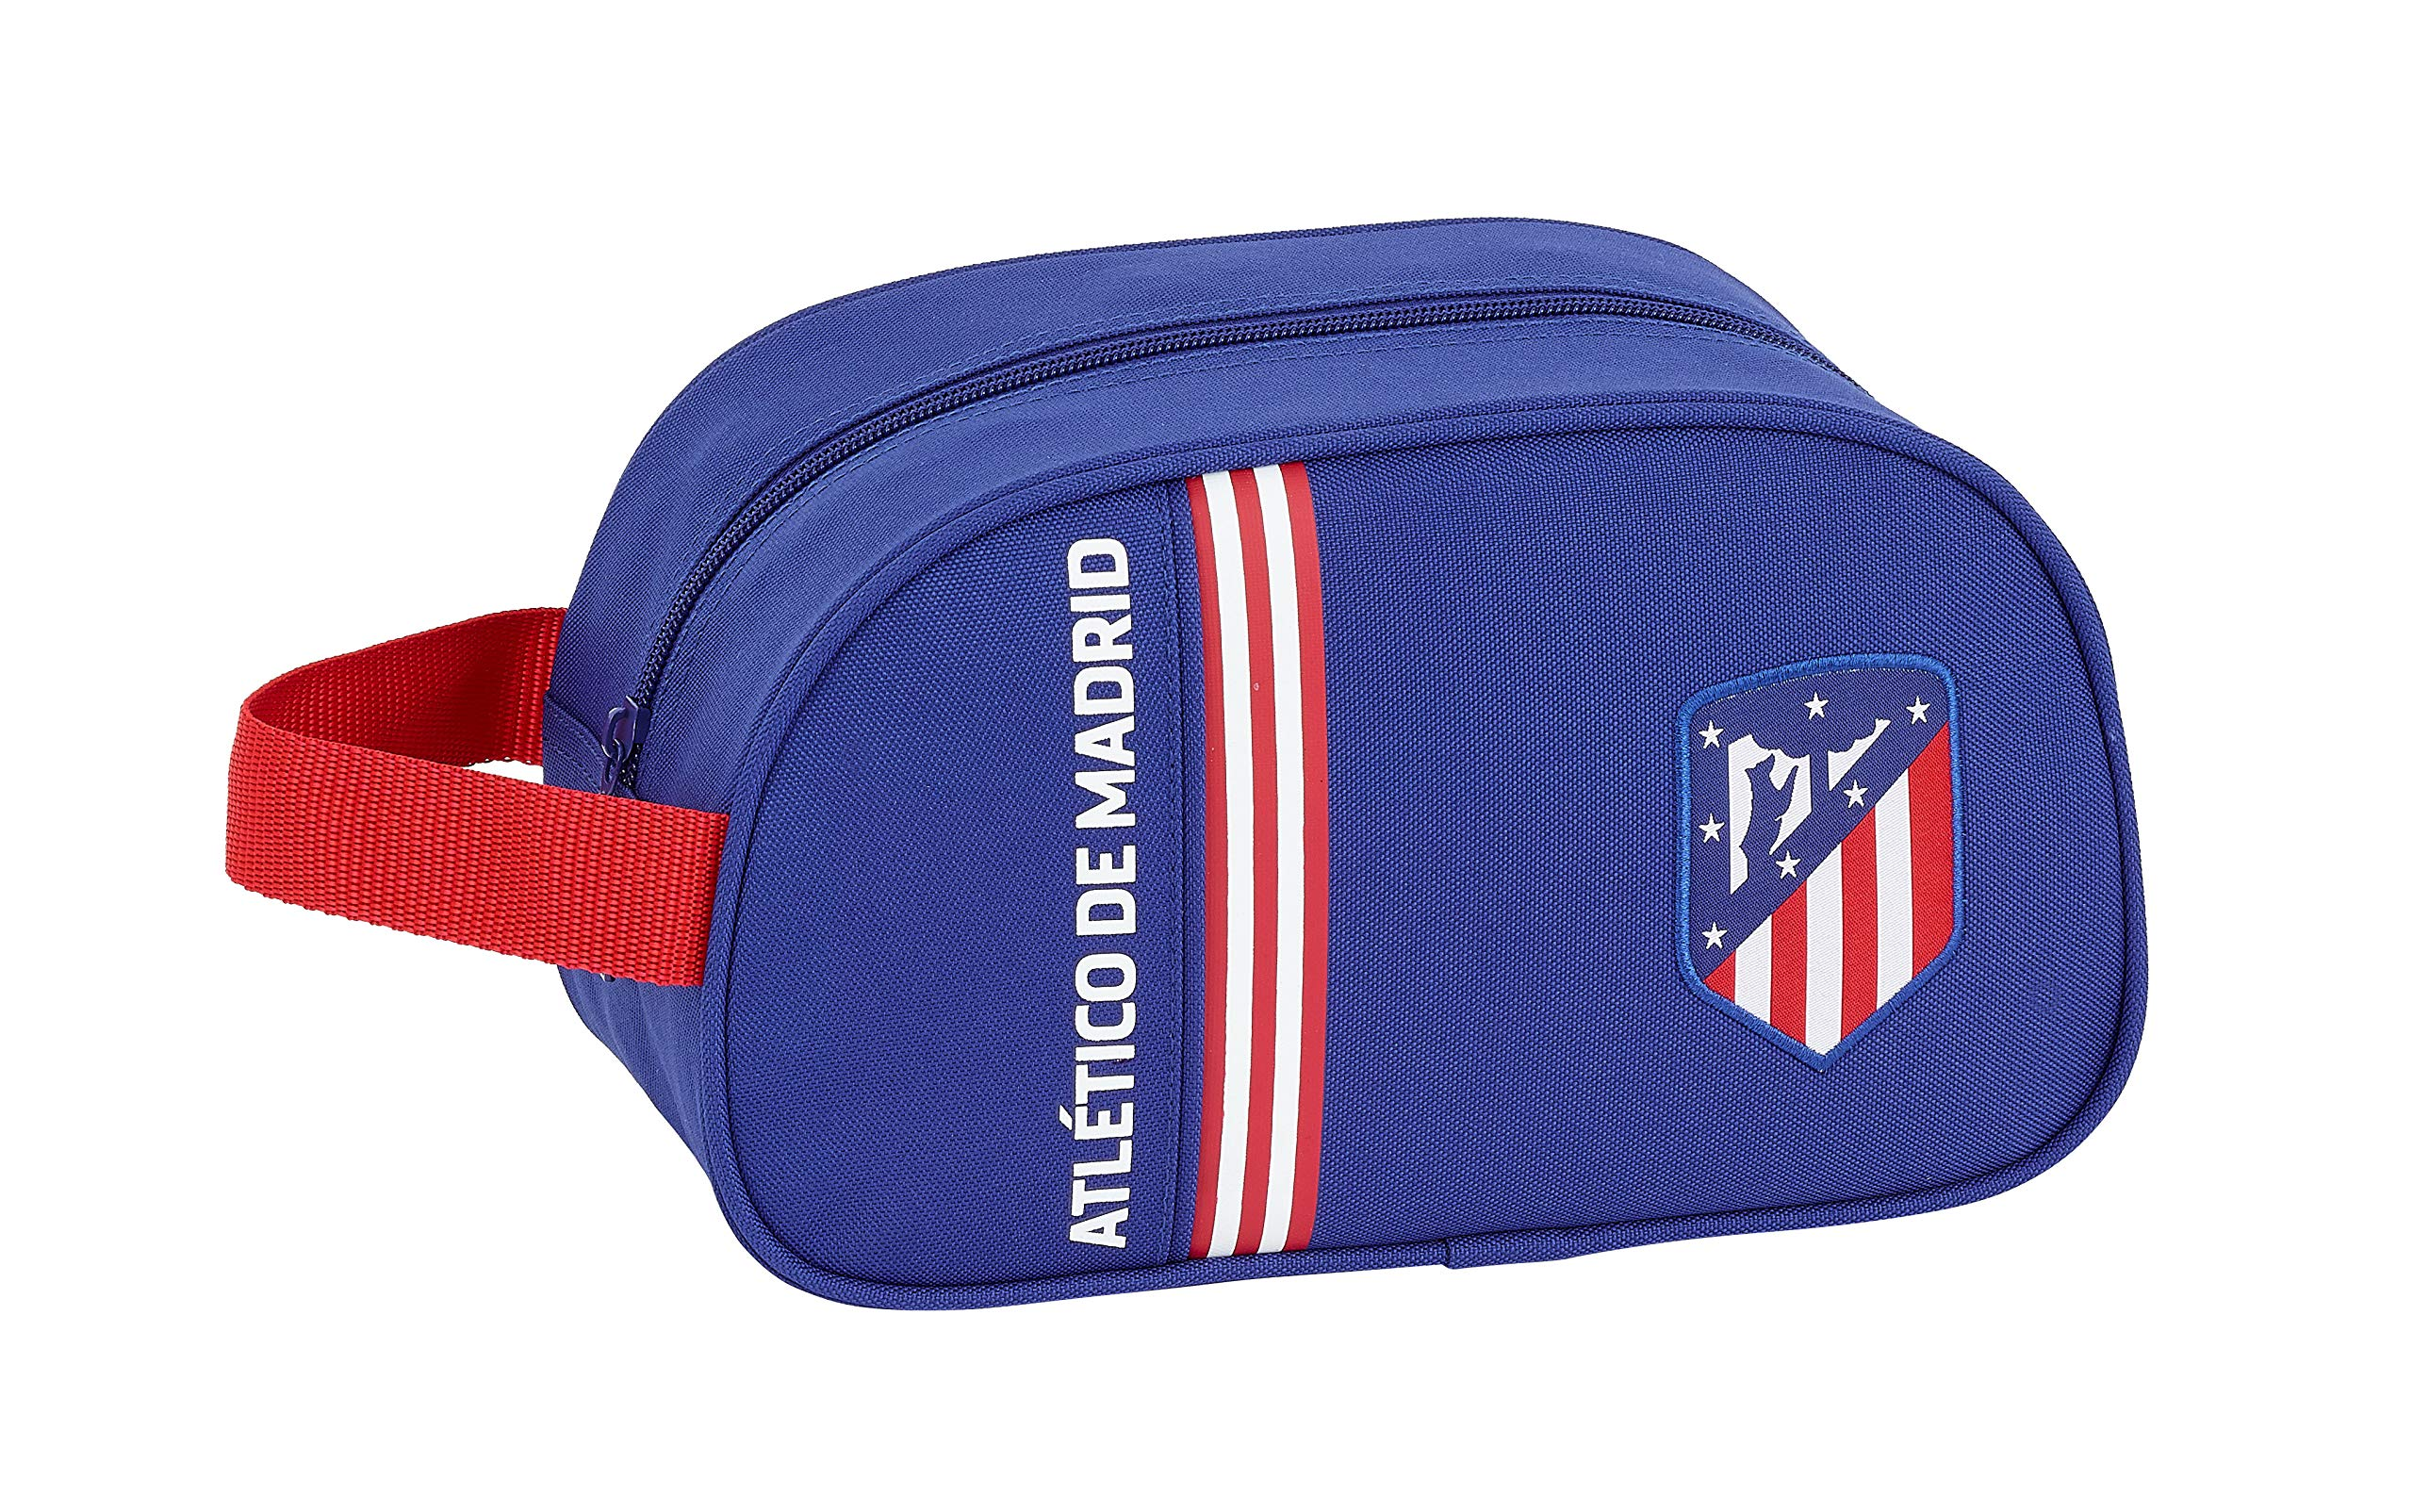 Atlético de Madrid «In Blue» Oficial Mochila Escolar Infantil Mediano con Asa 260x120x150mm